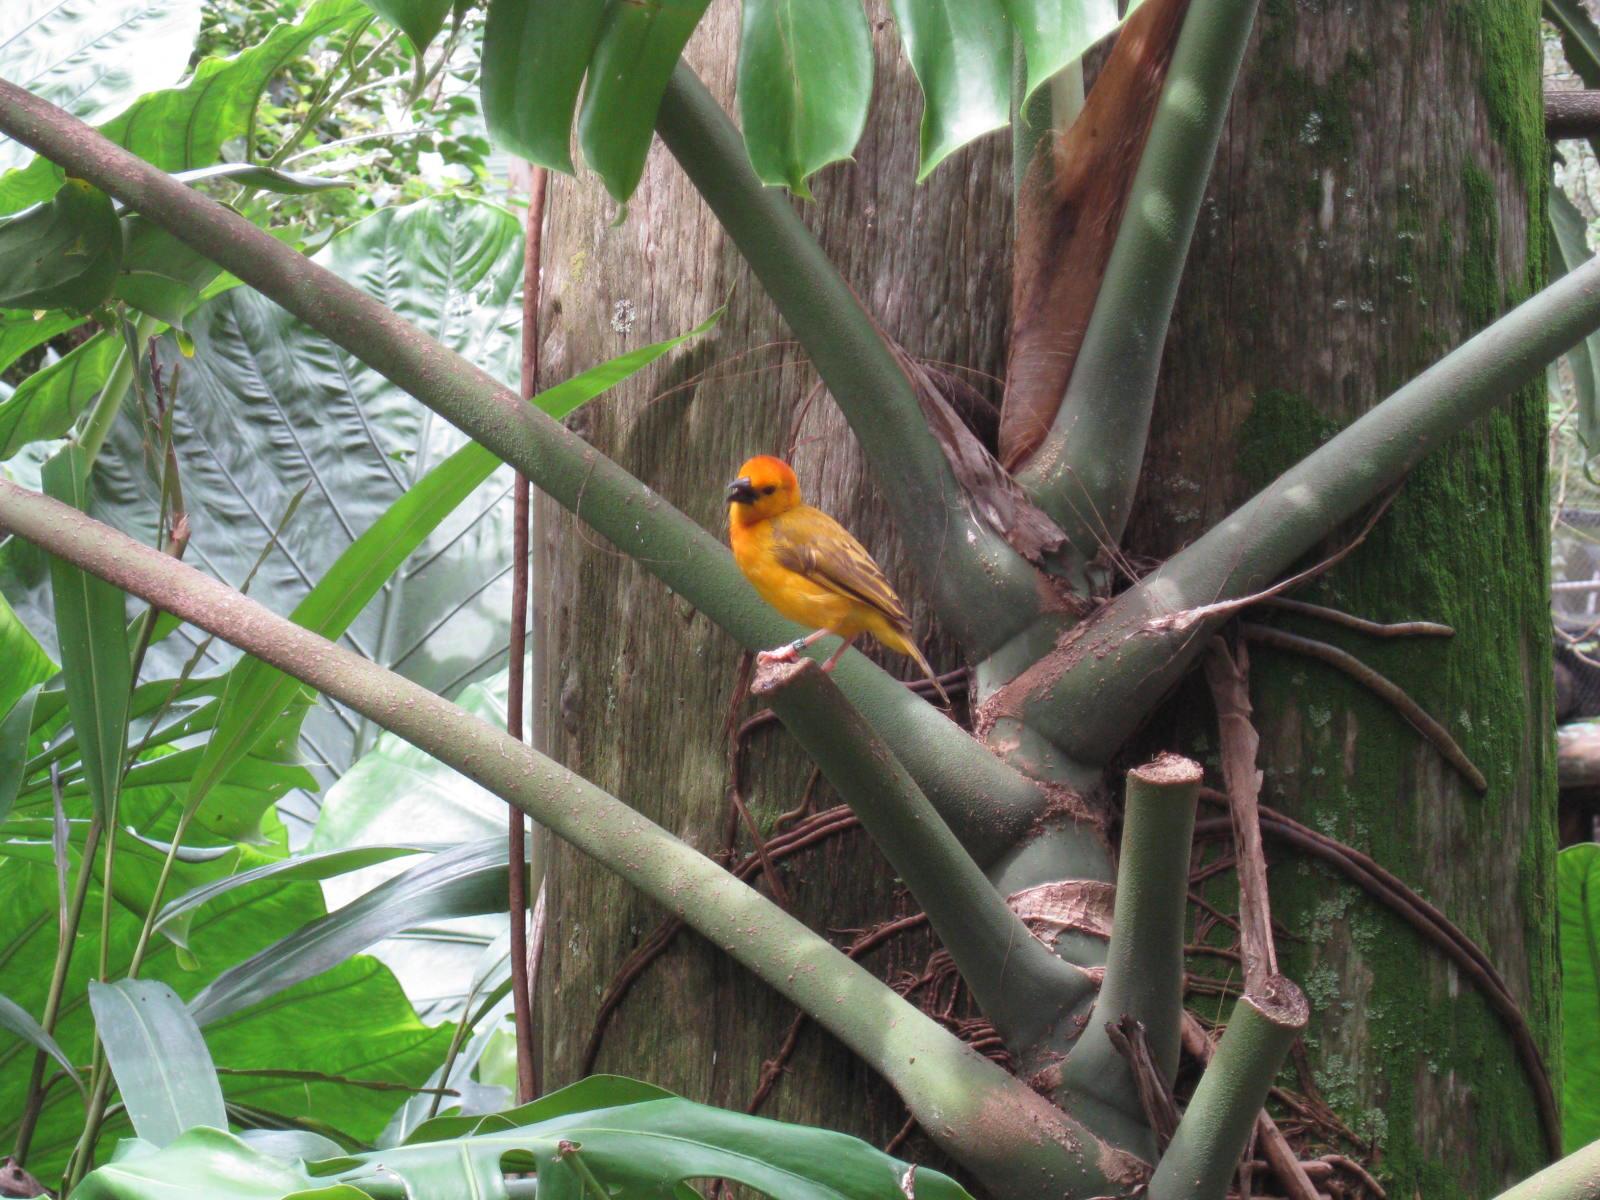 Gorilla trail bird sanctuary in Animal Kingdom Disney World